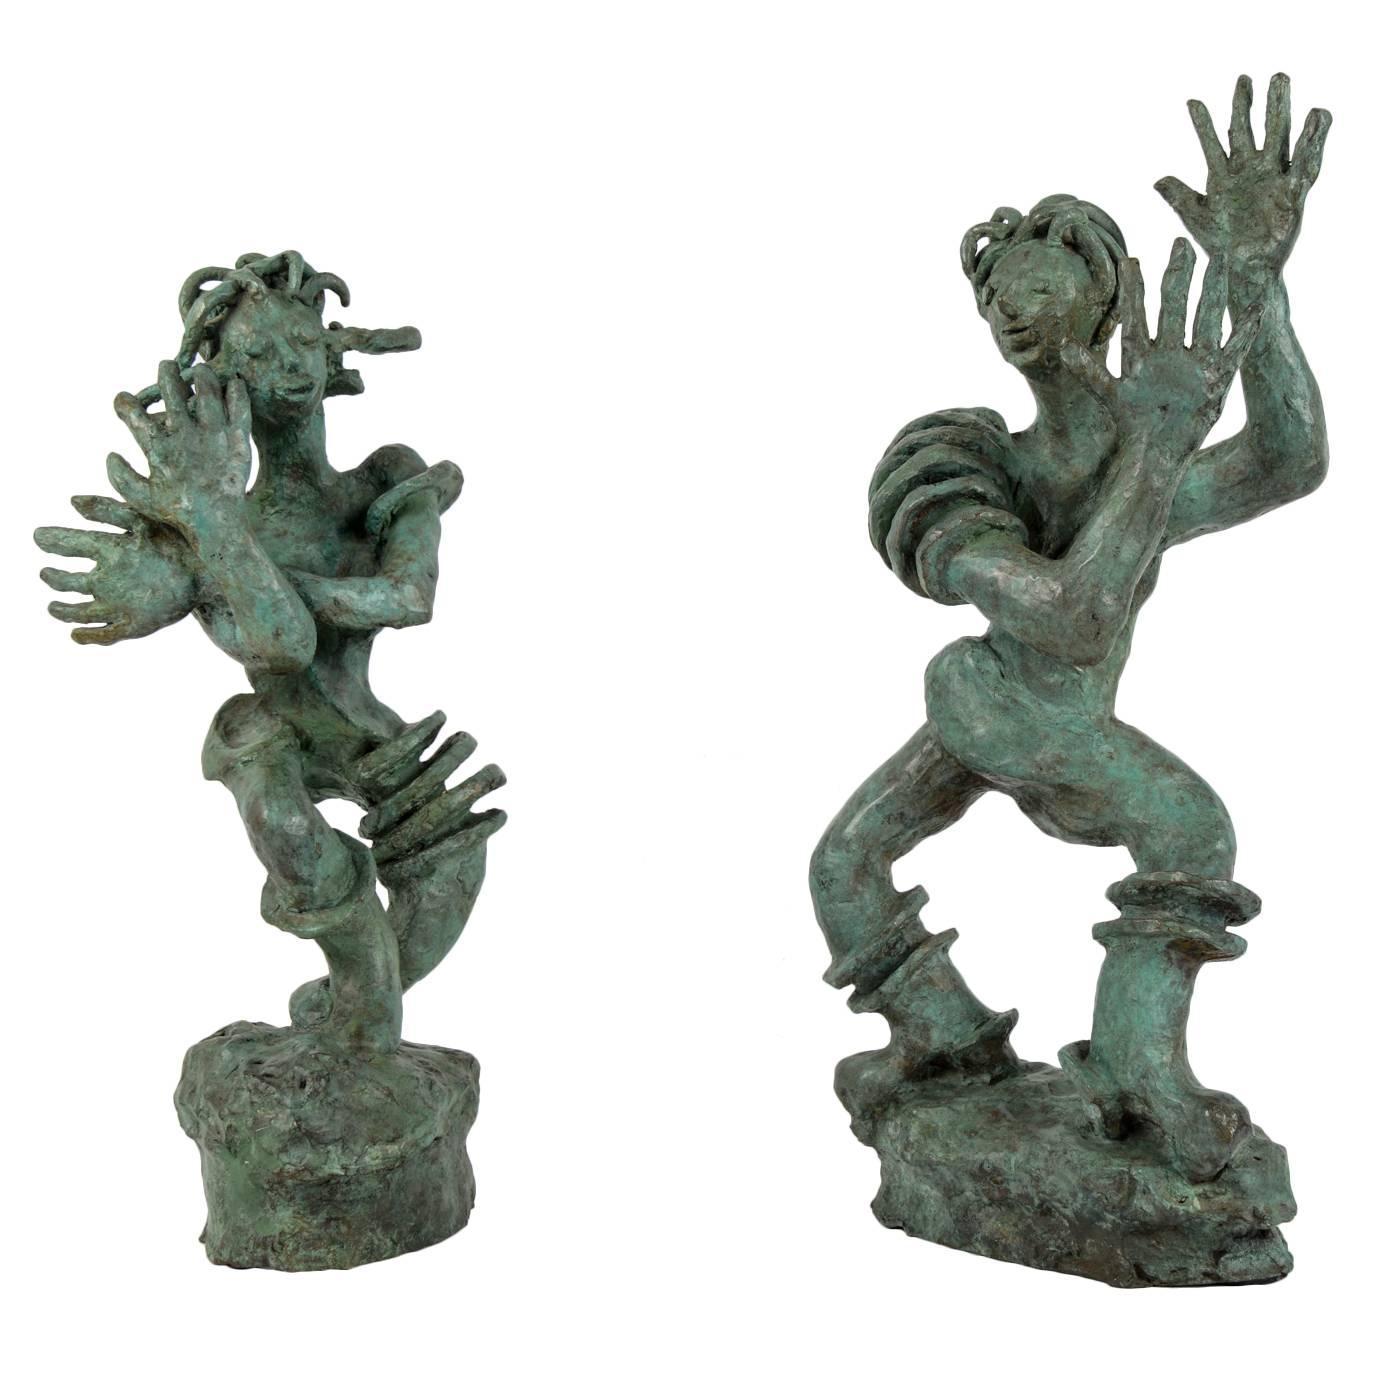 Germaine Nordmann Bronze Sculptures, circa 1940